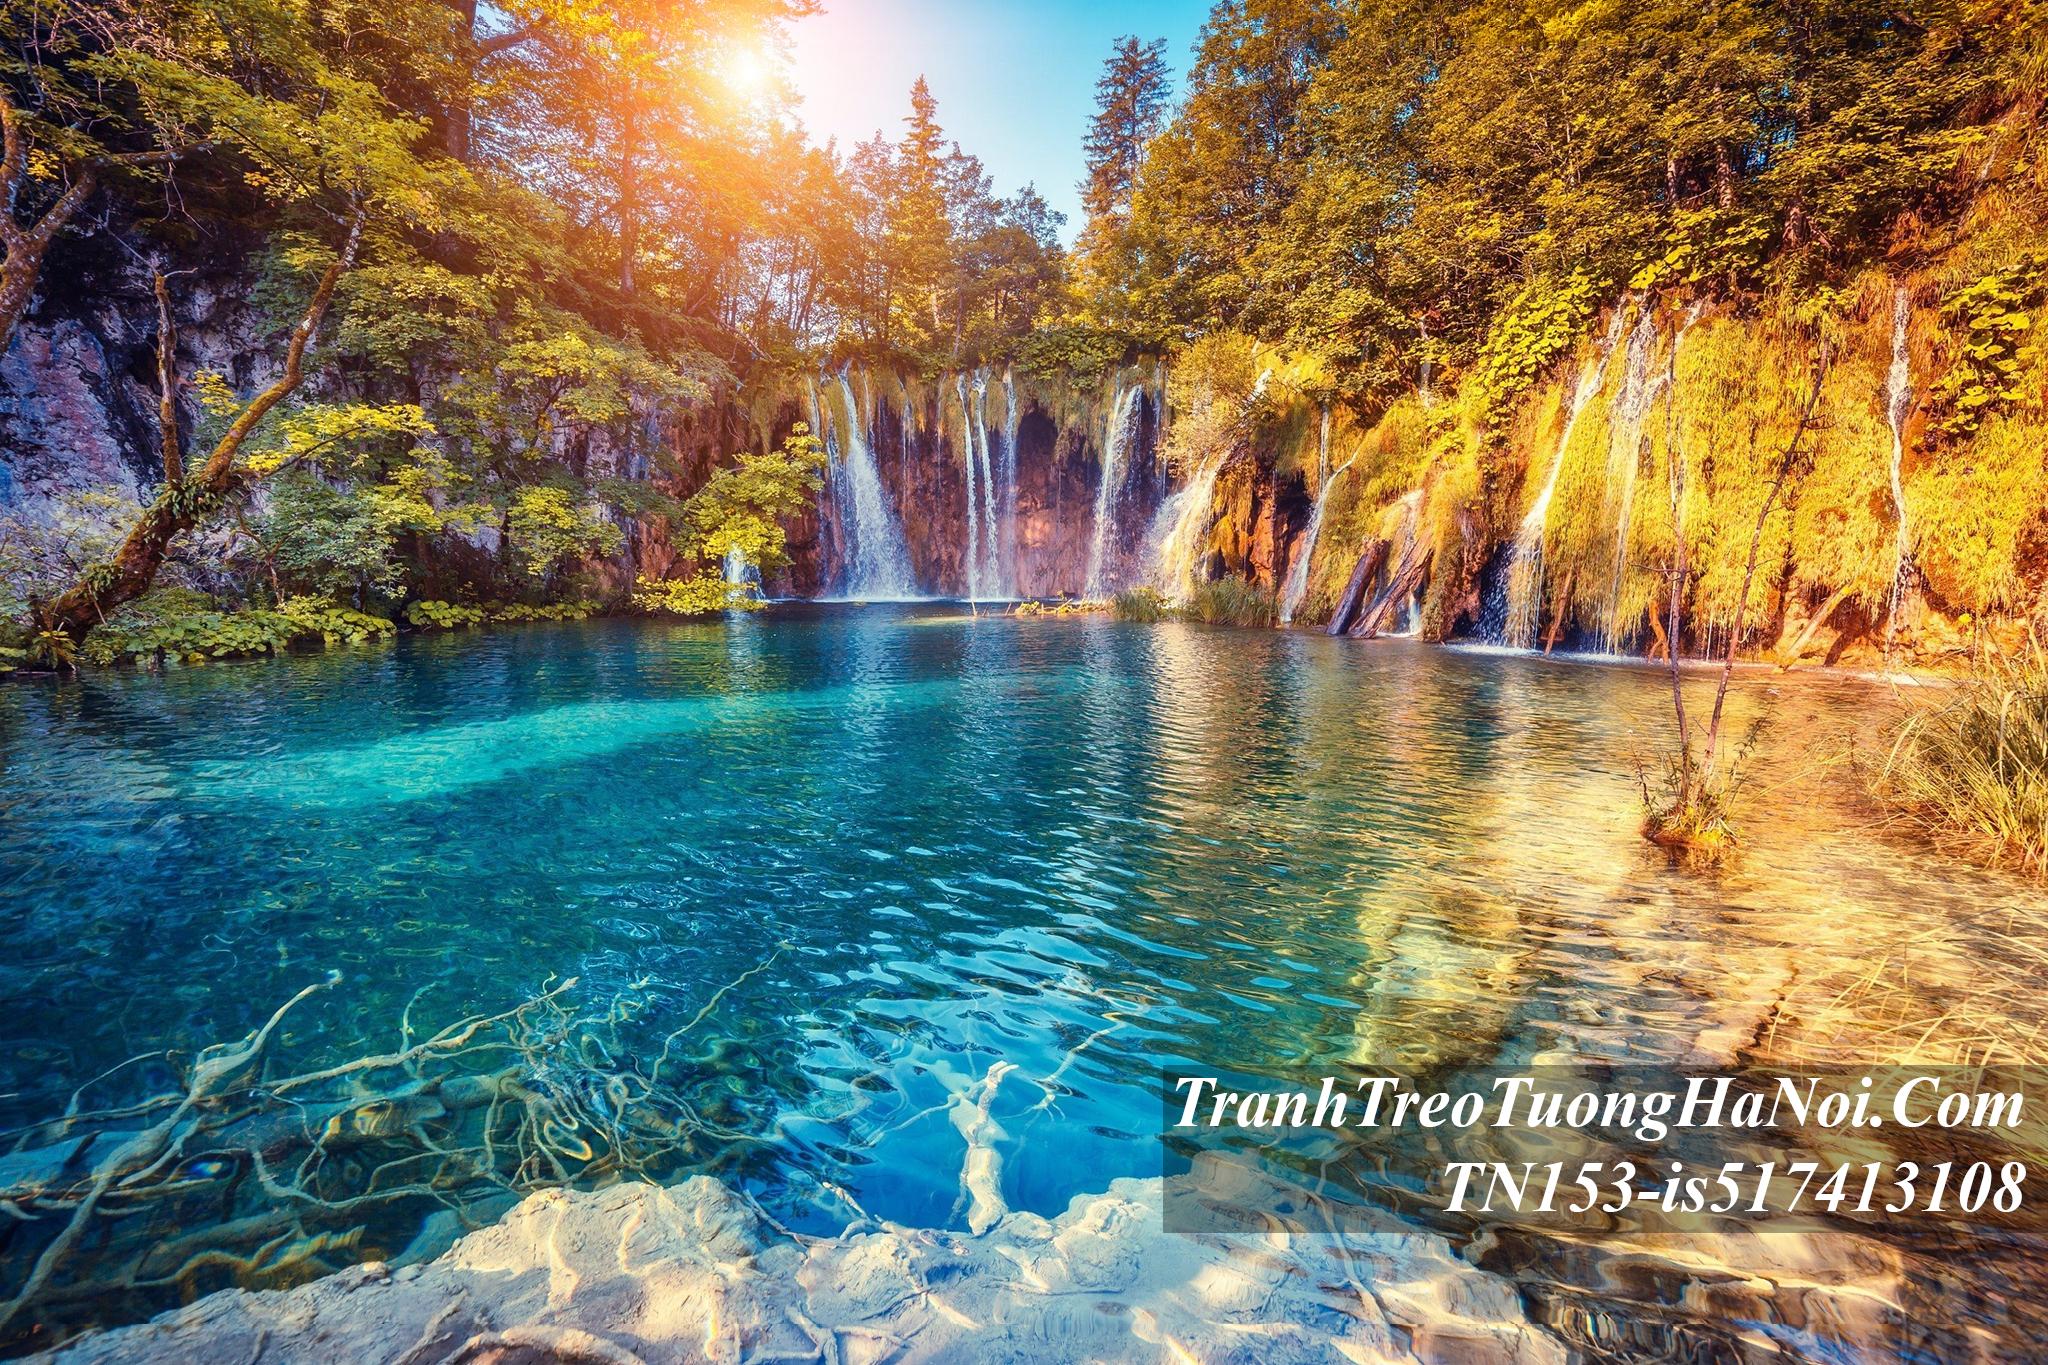 Phong canh dep thac nuoc mua thu amia TN153-is517413108-Croatia